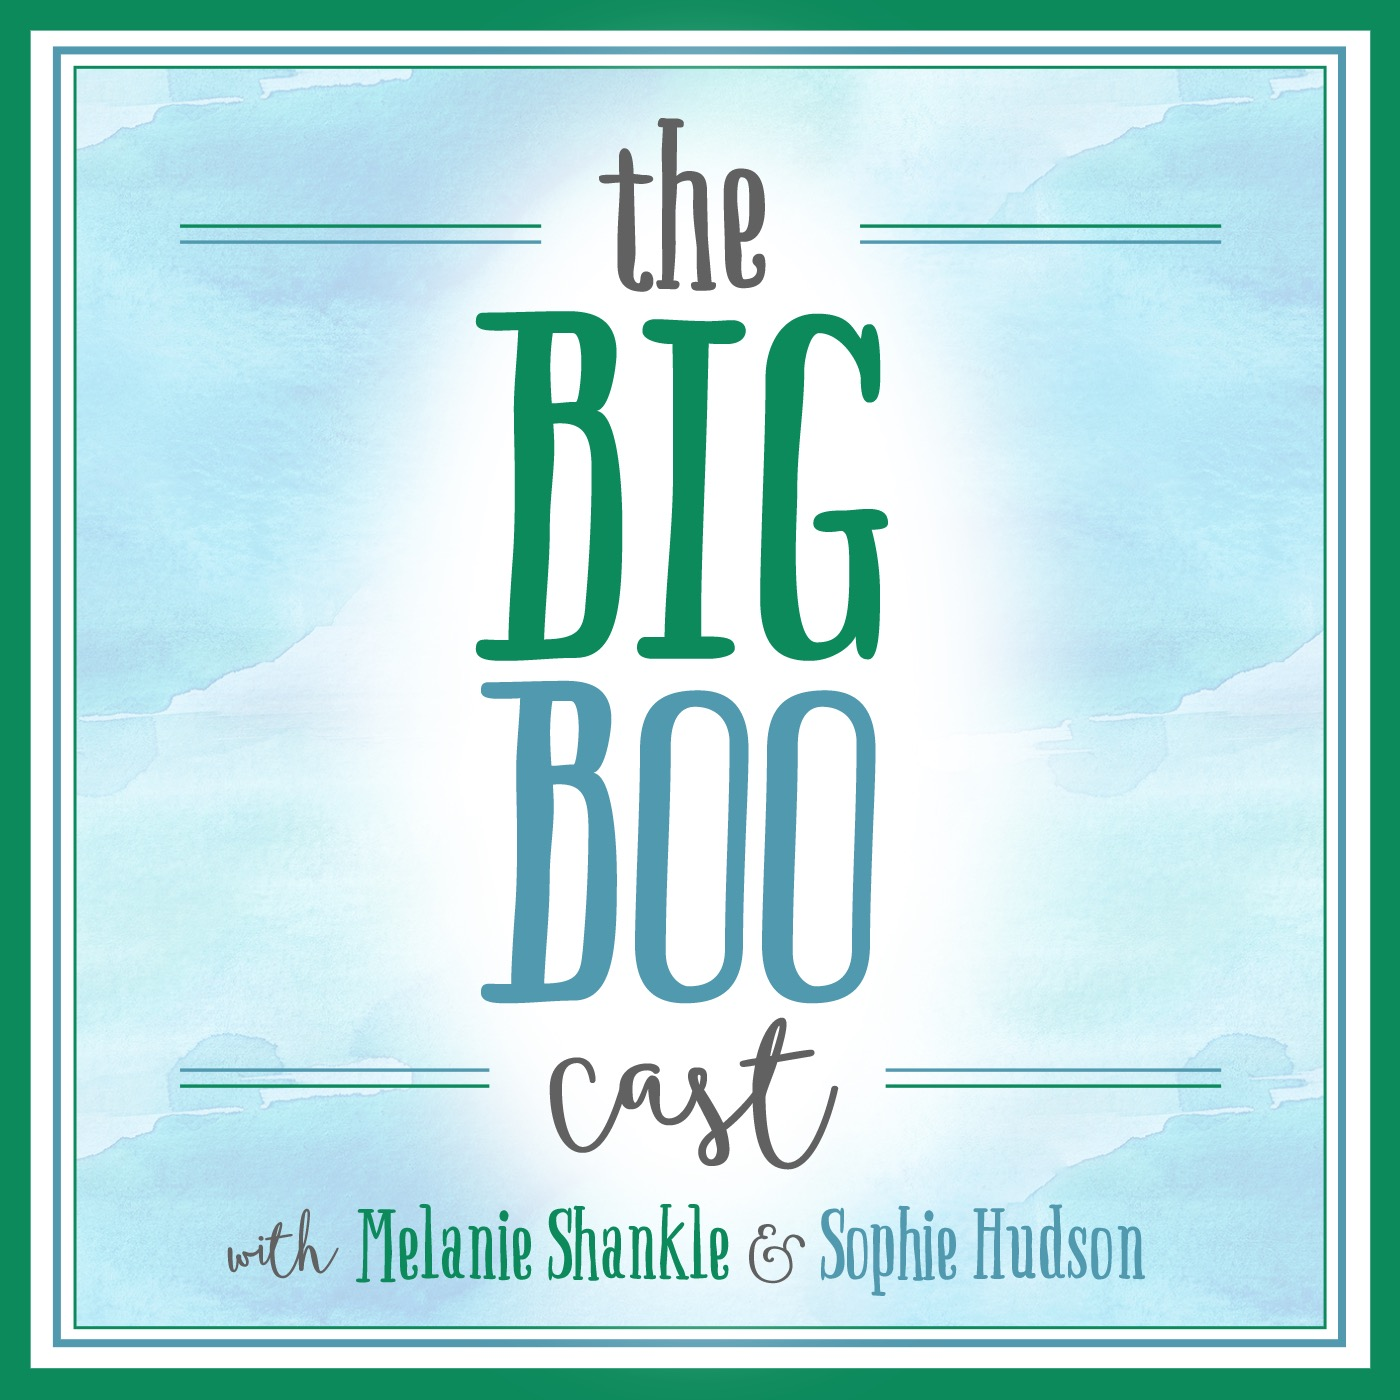 The Big Boo Cast, Episode 192